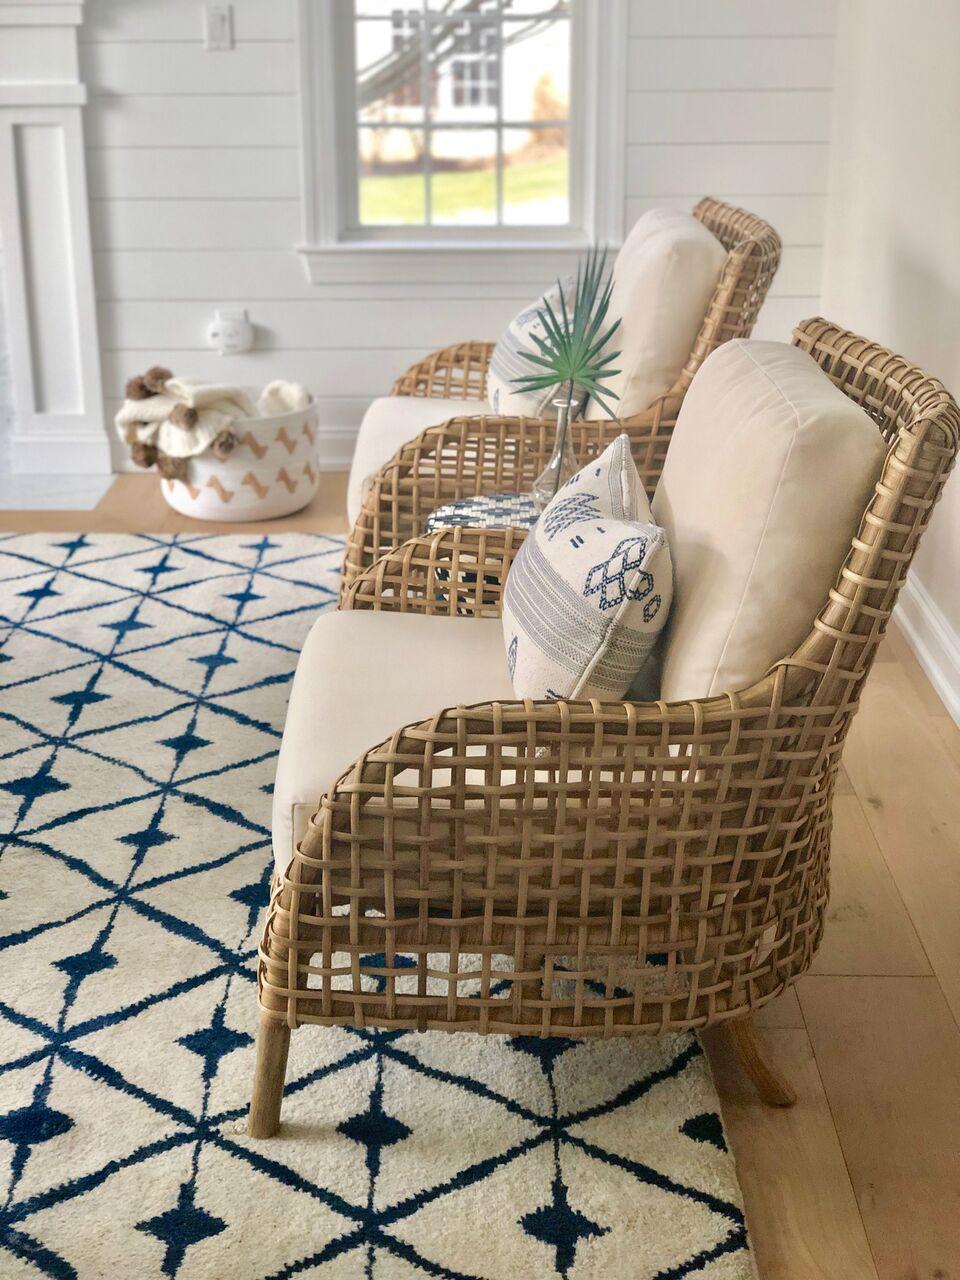 stephanie-kraus-designs-mainline-pa-family-room-rattan-chairs.jpg